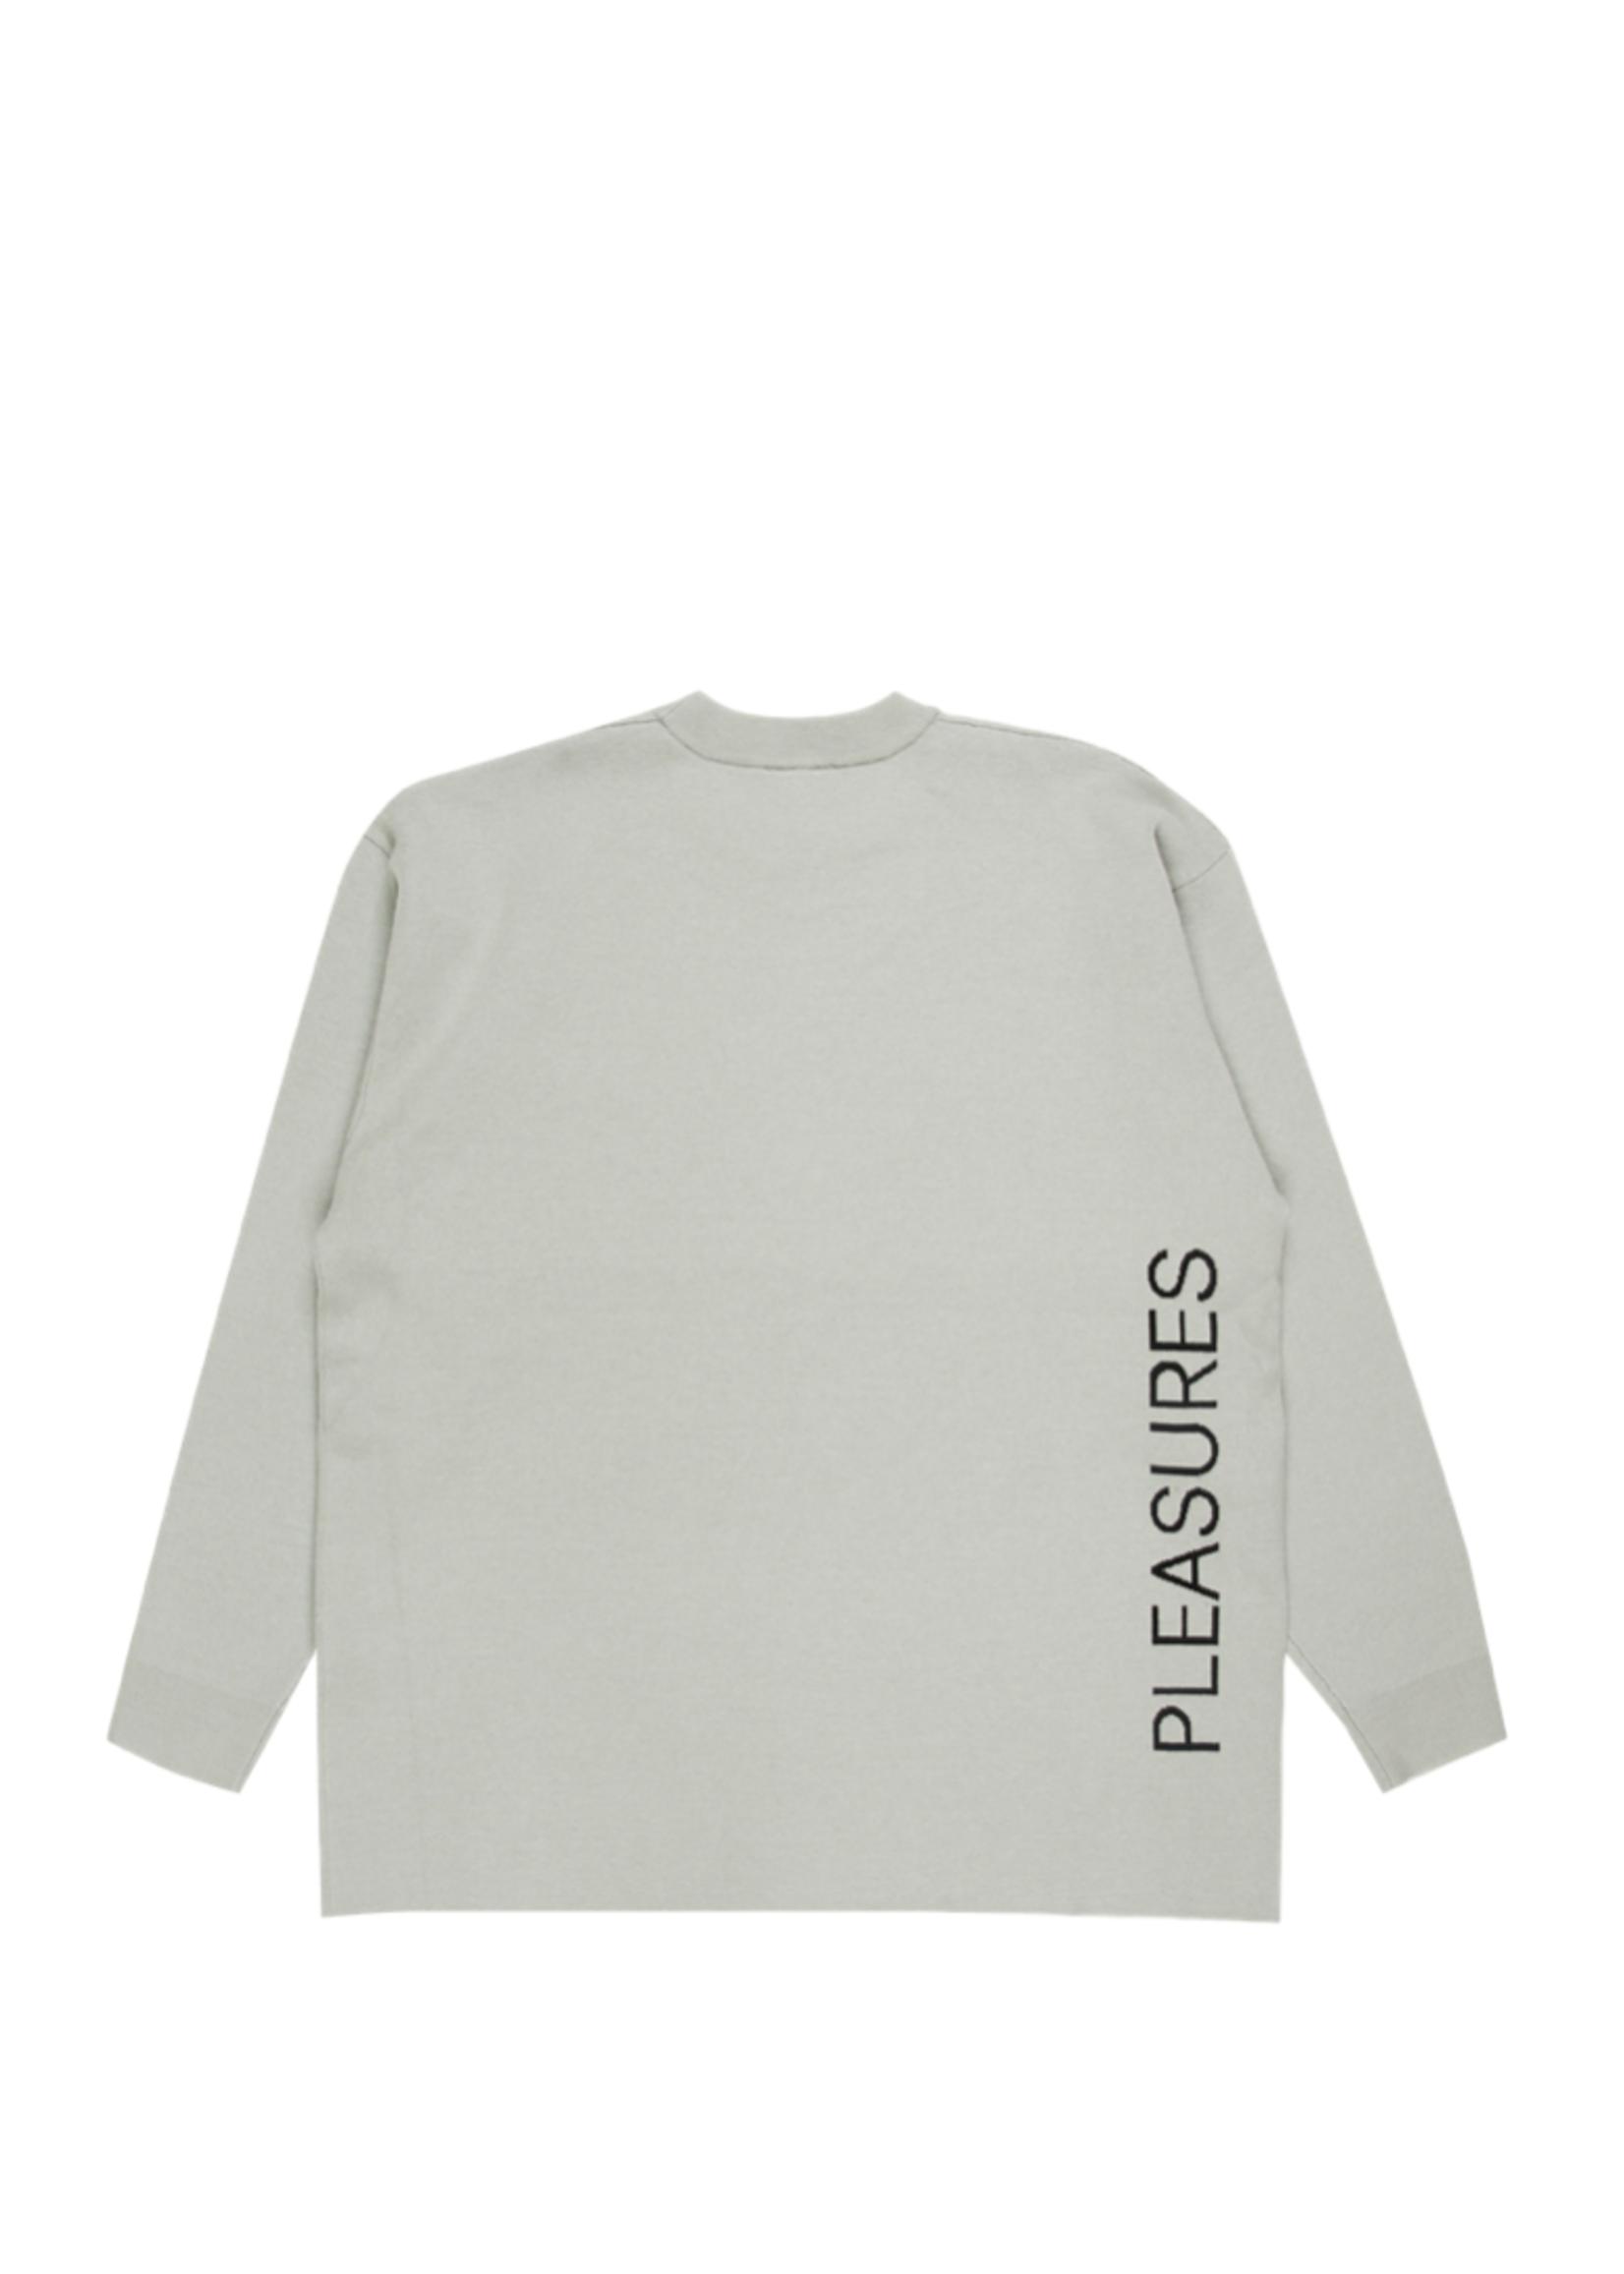 PLEASURES New Order Lowlife Sweater in Grey